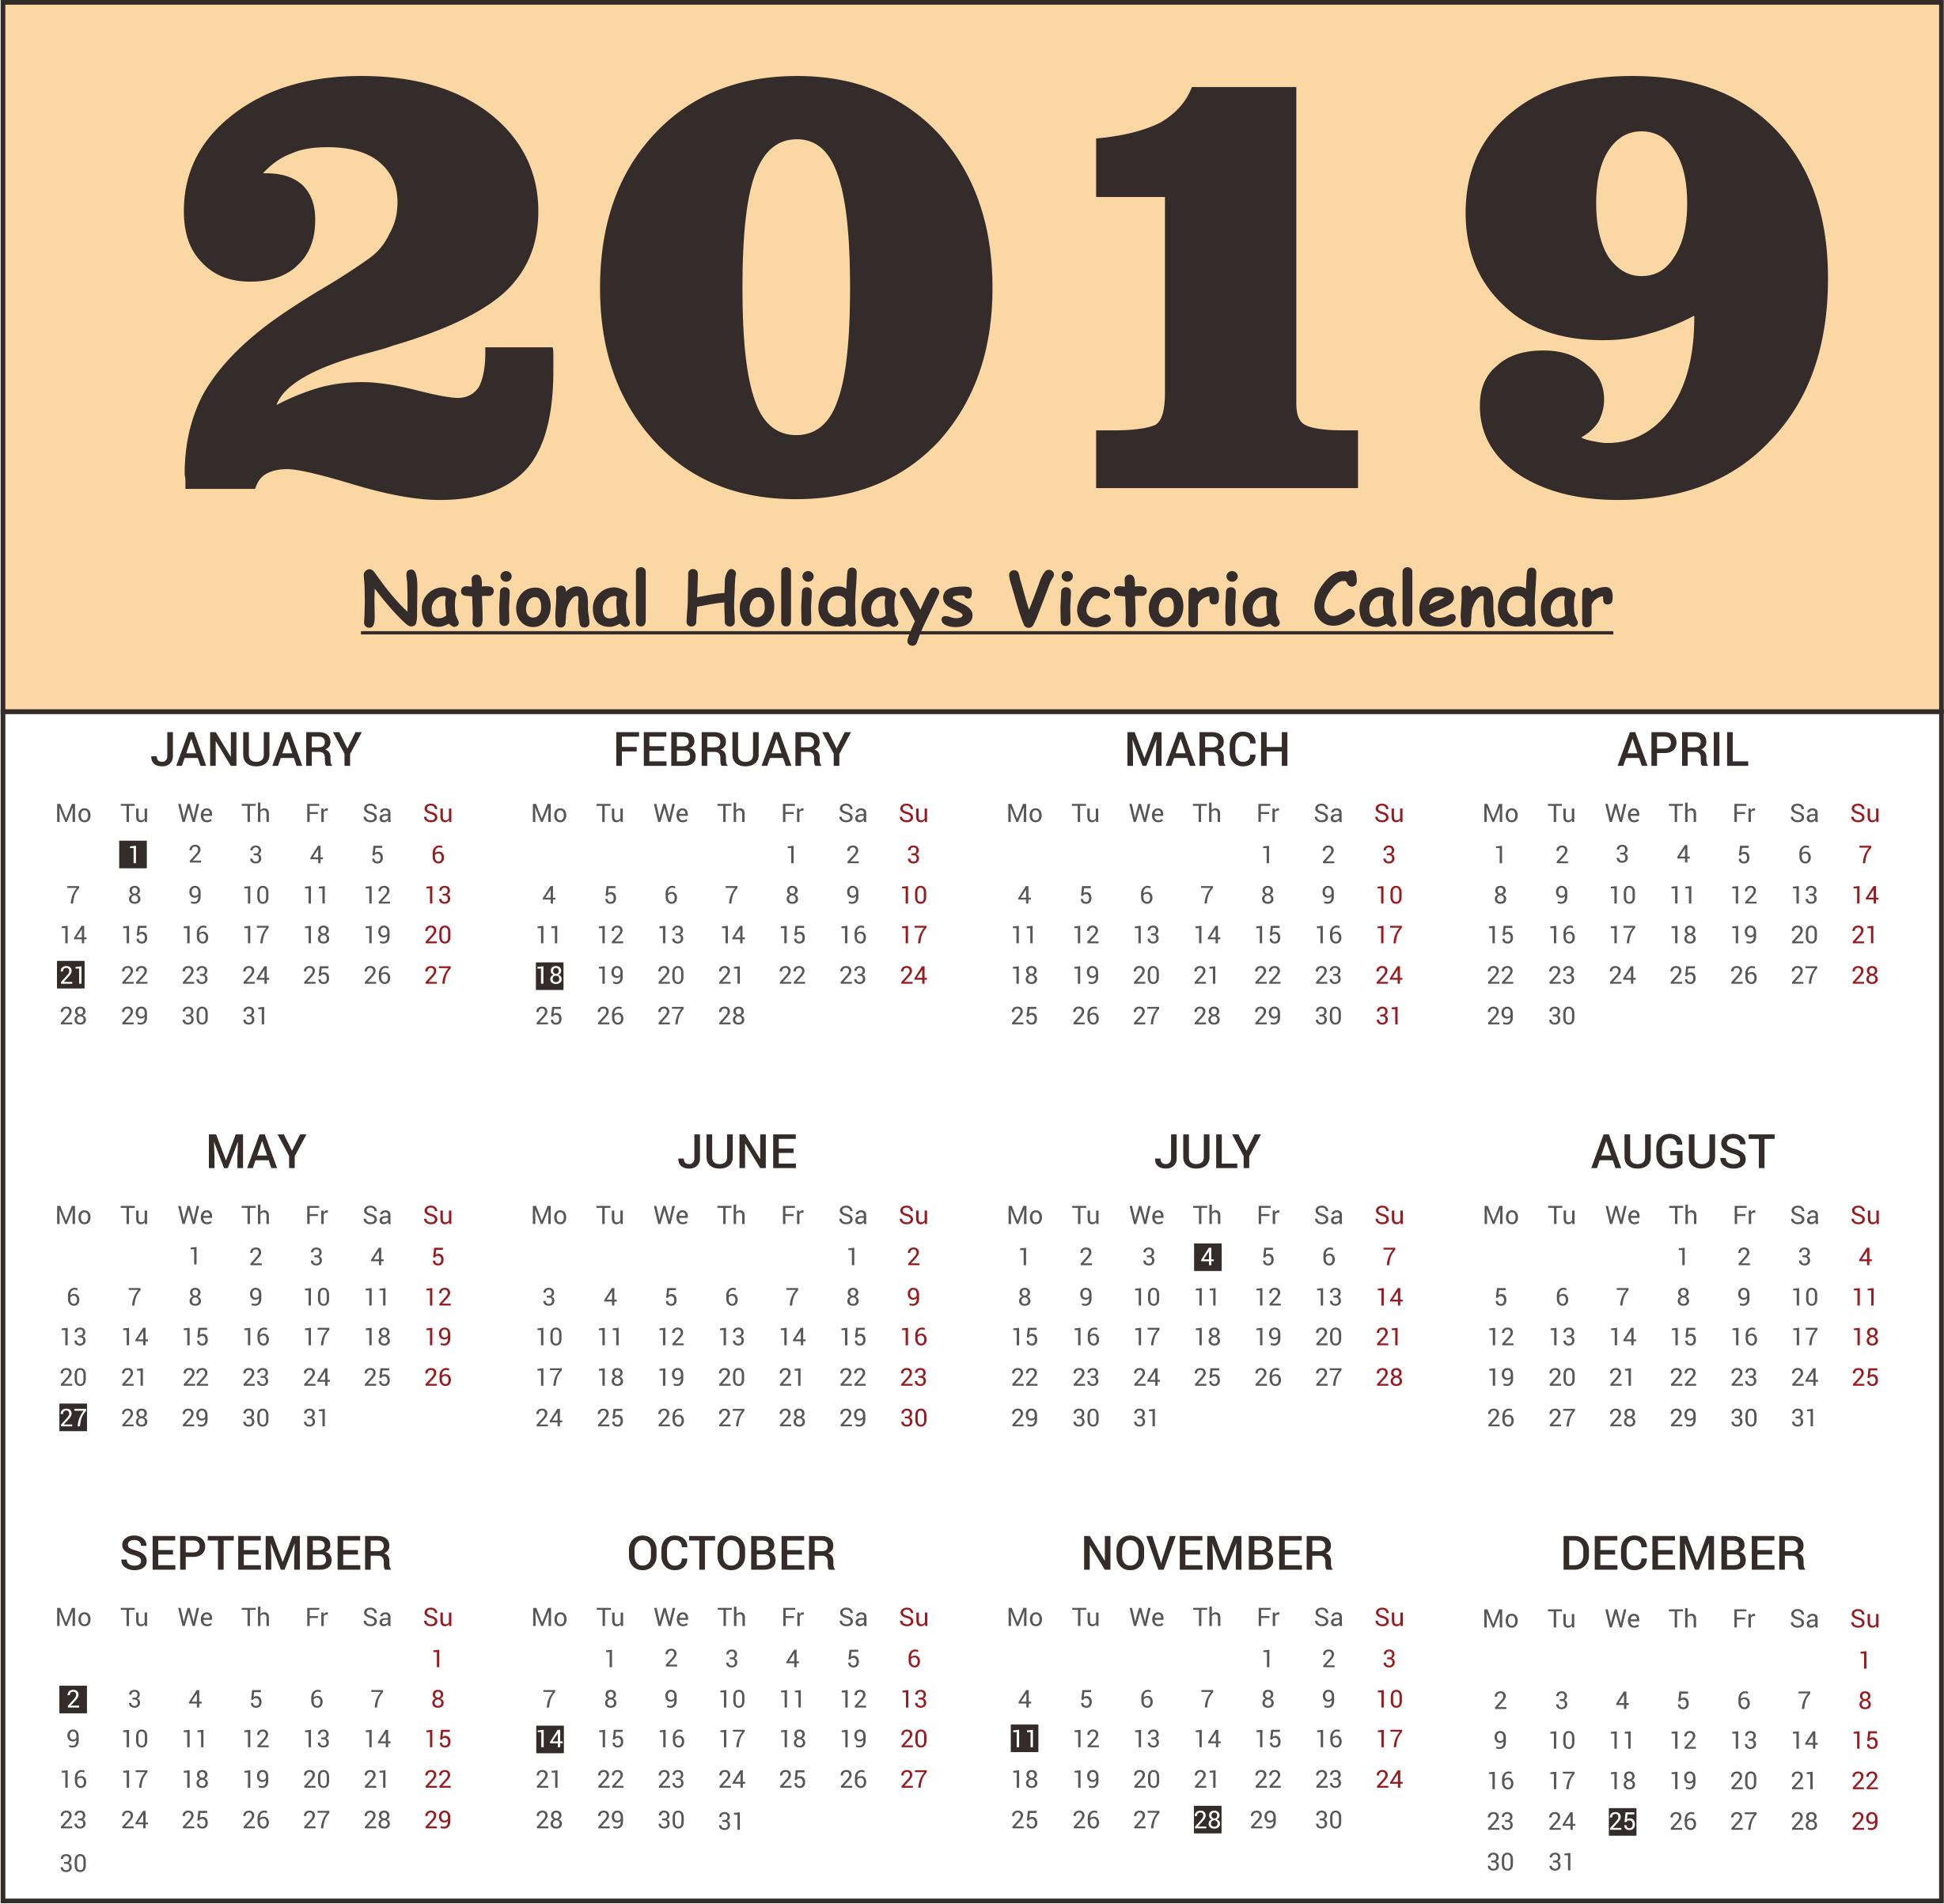 Victoria National Holidays 2019 Templates